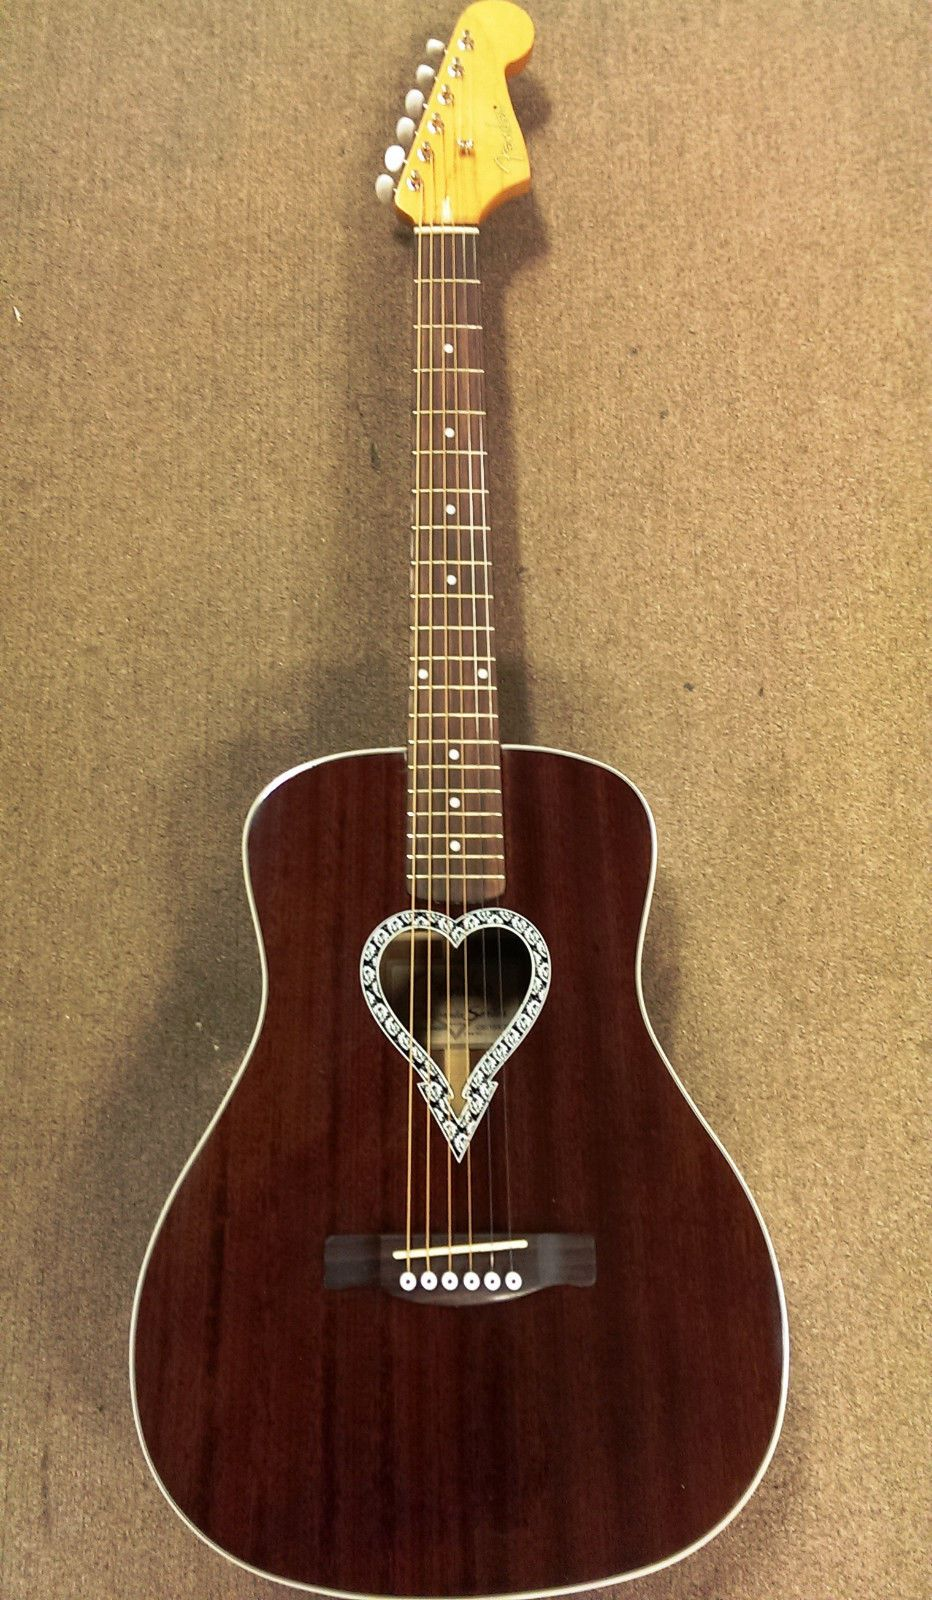 Fender Alkaline Trio Malibu Acoustic Guitar Mahogany Parlor Size Heart Rosette Acoustic Guitar For Sale Alkaline Trio Guitar